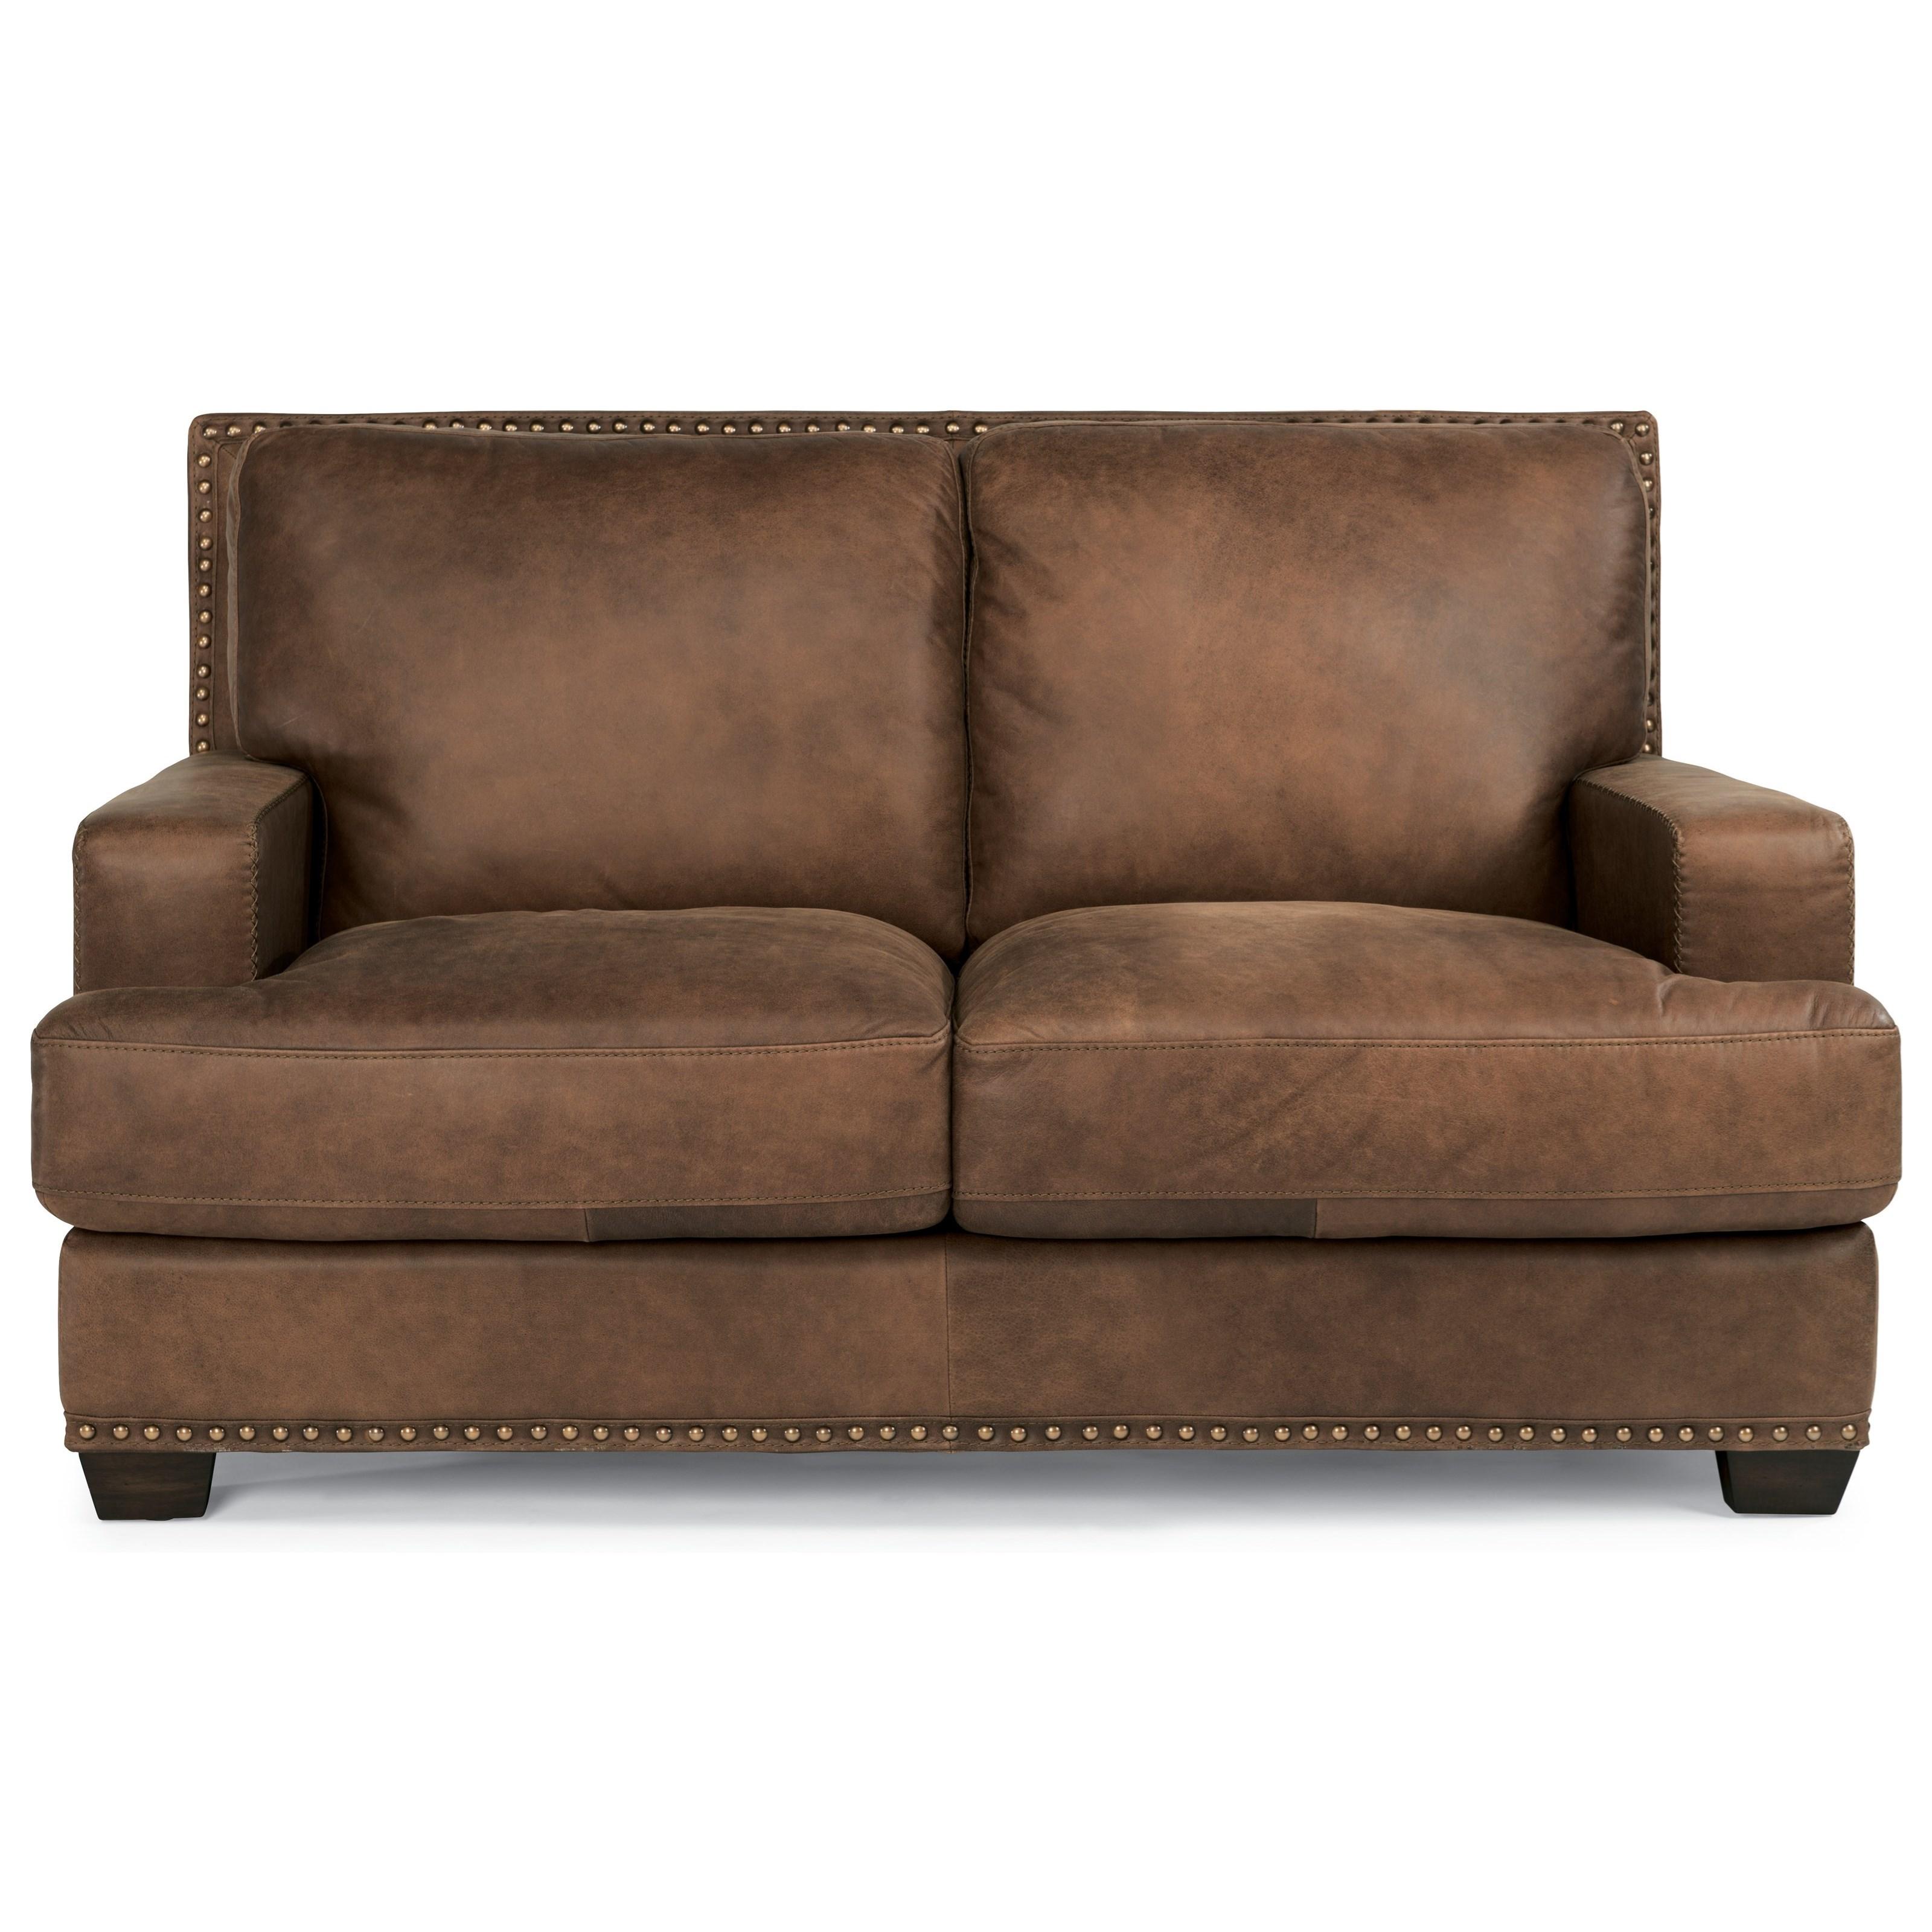 Flexsteel Latitudes-Fremont Leather Loveseat  - Item Number: 1324-20